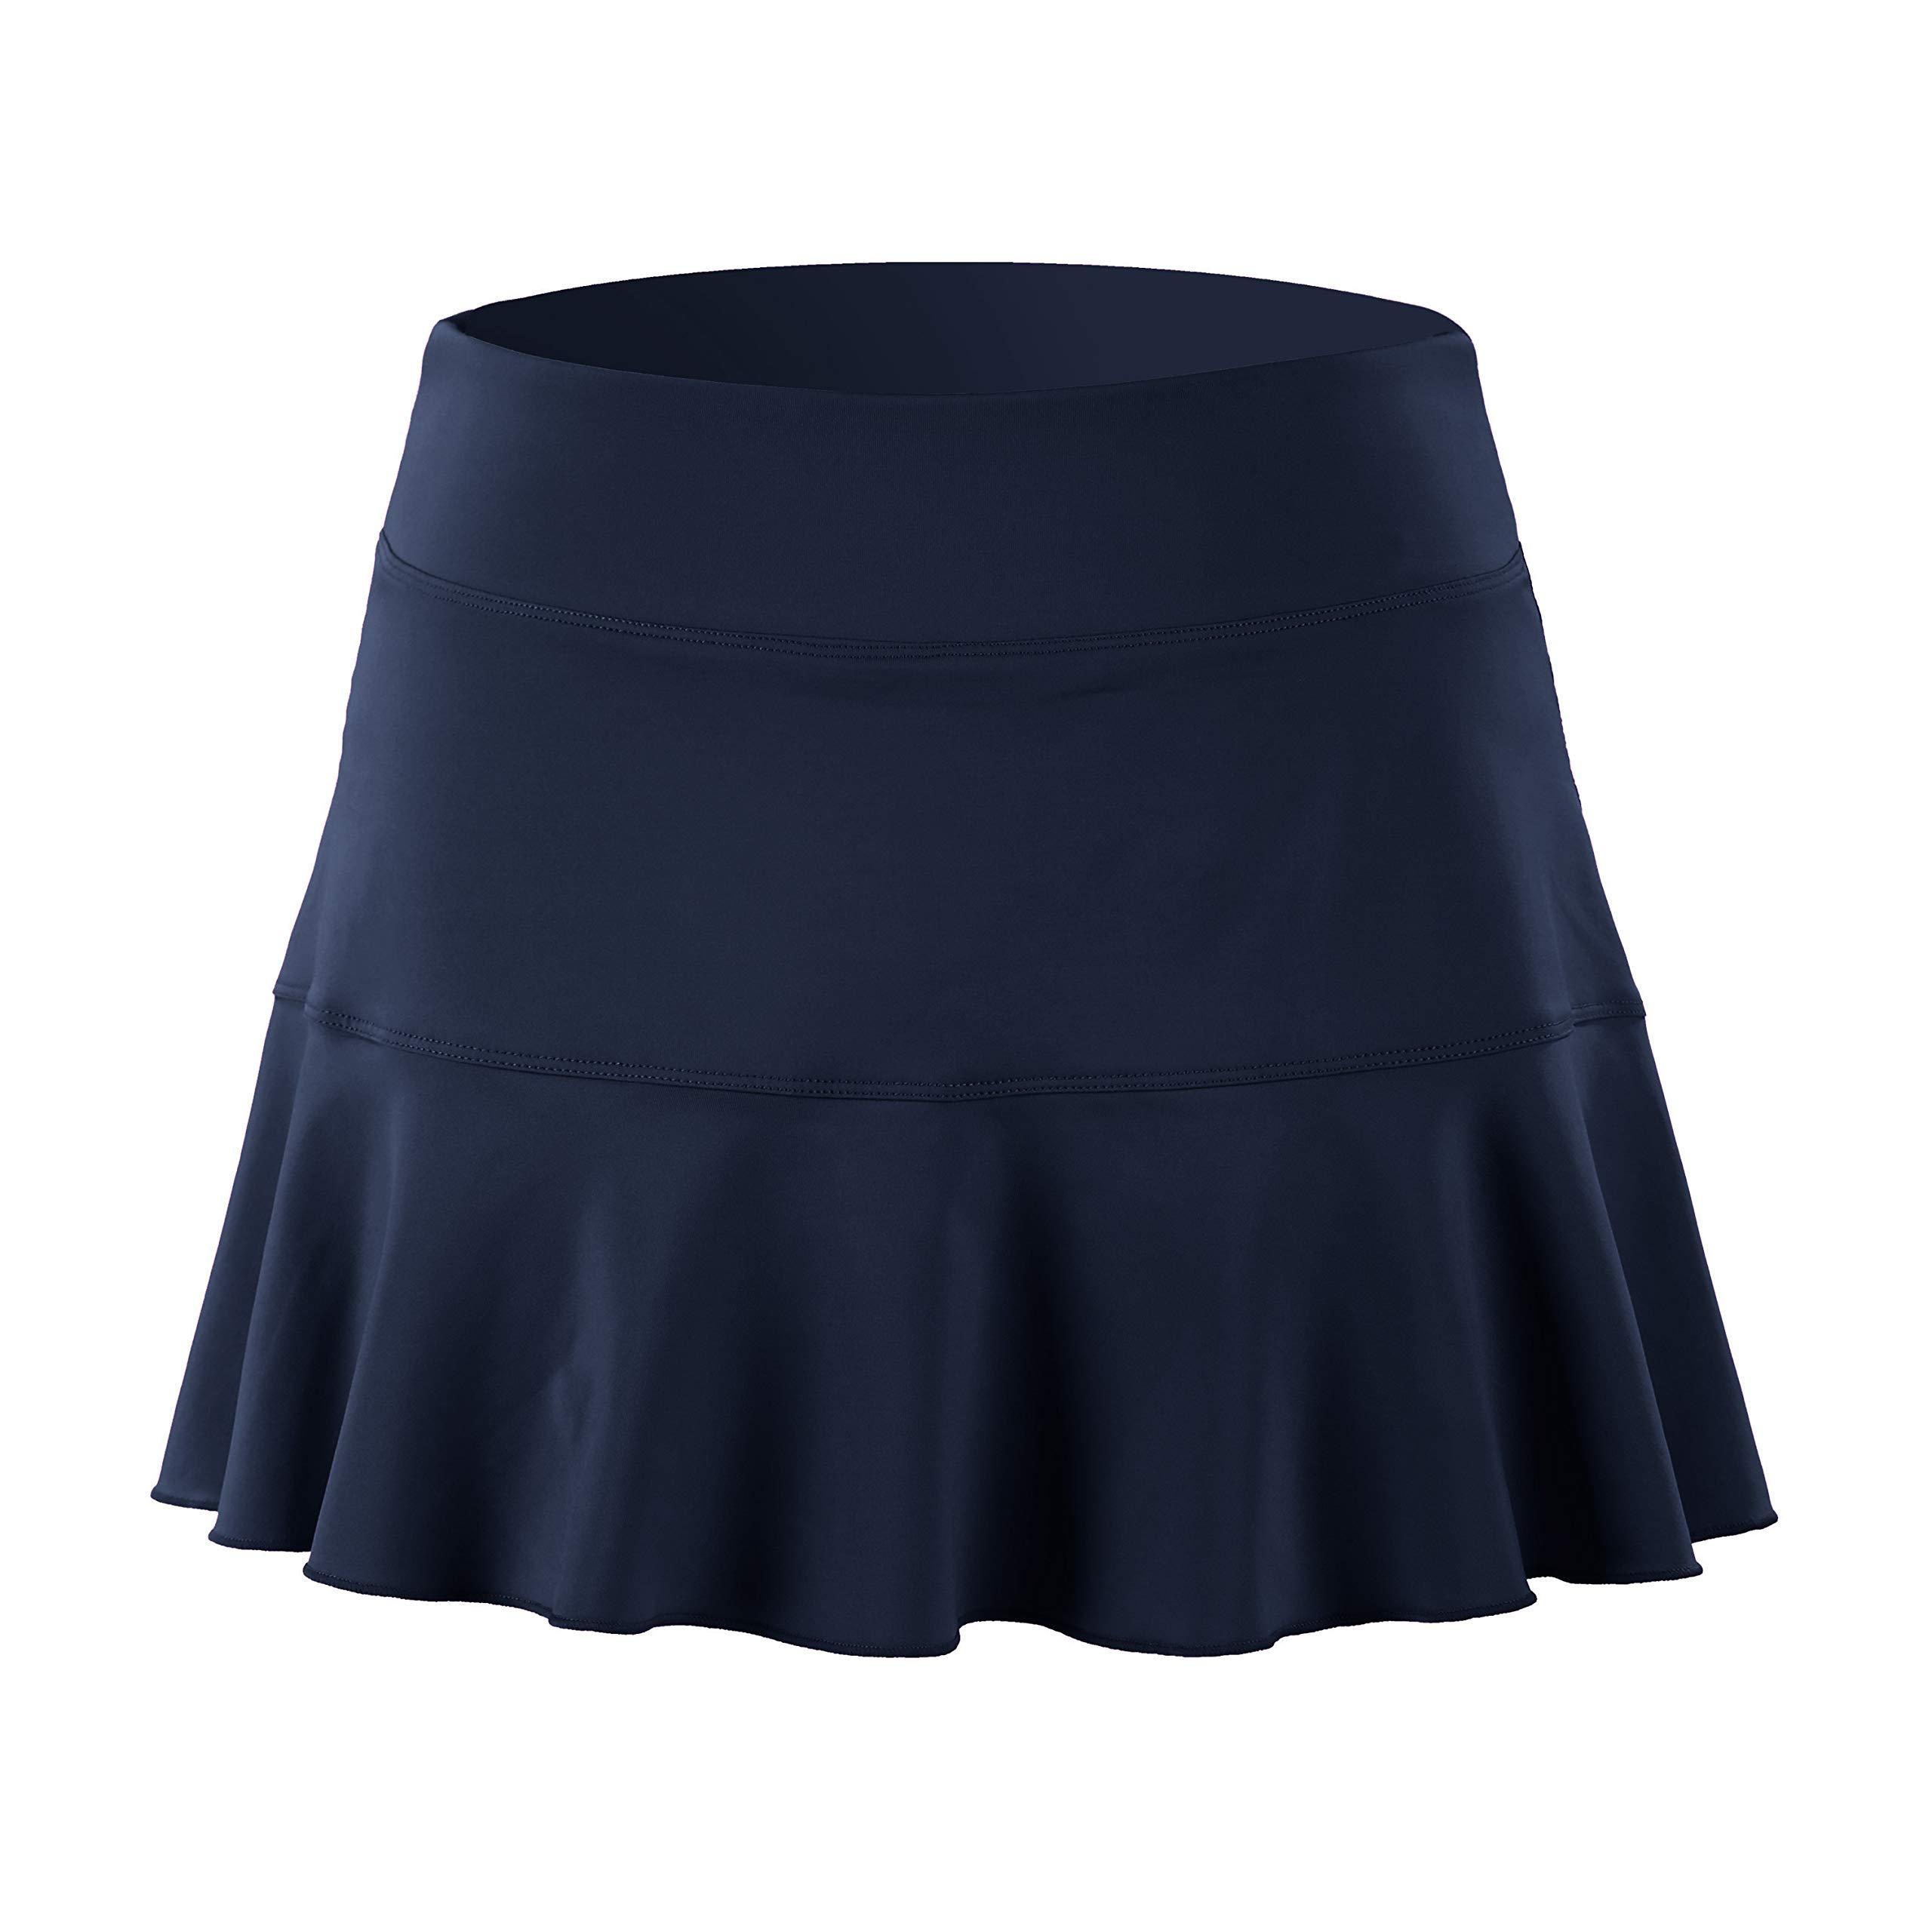 32e-SANERYI Women's Pleated Elastic Quick-Drying Tennis Skirt with Shorts Running Skort (X-Large, Navy Blue) by 32e-SANERYI